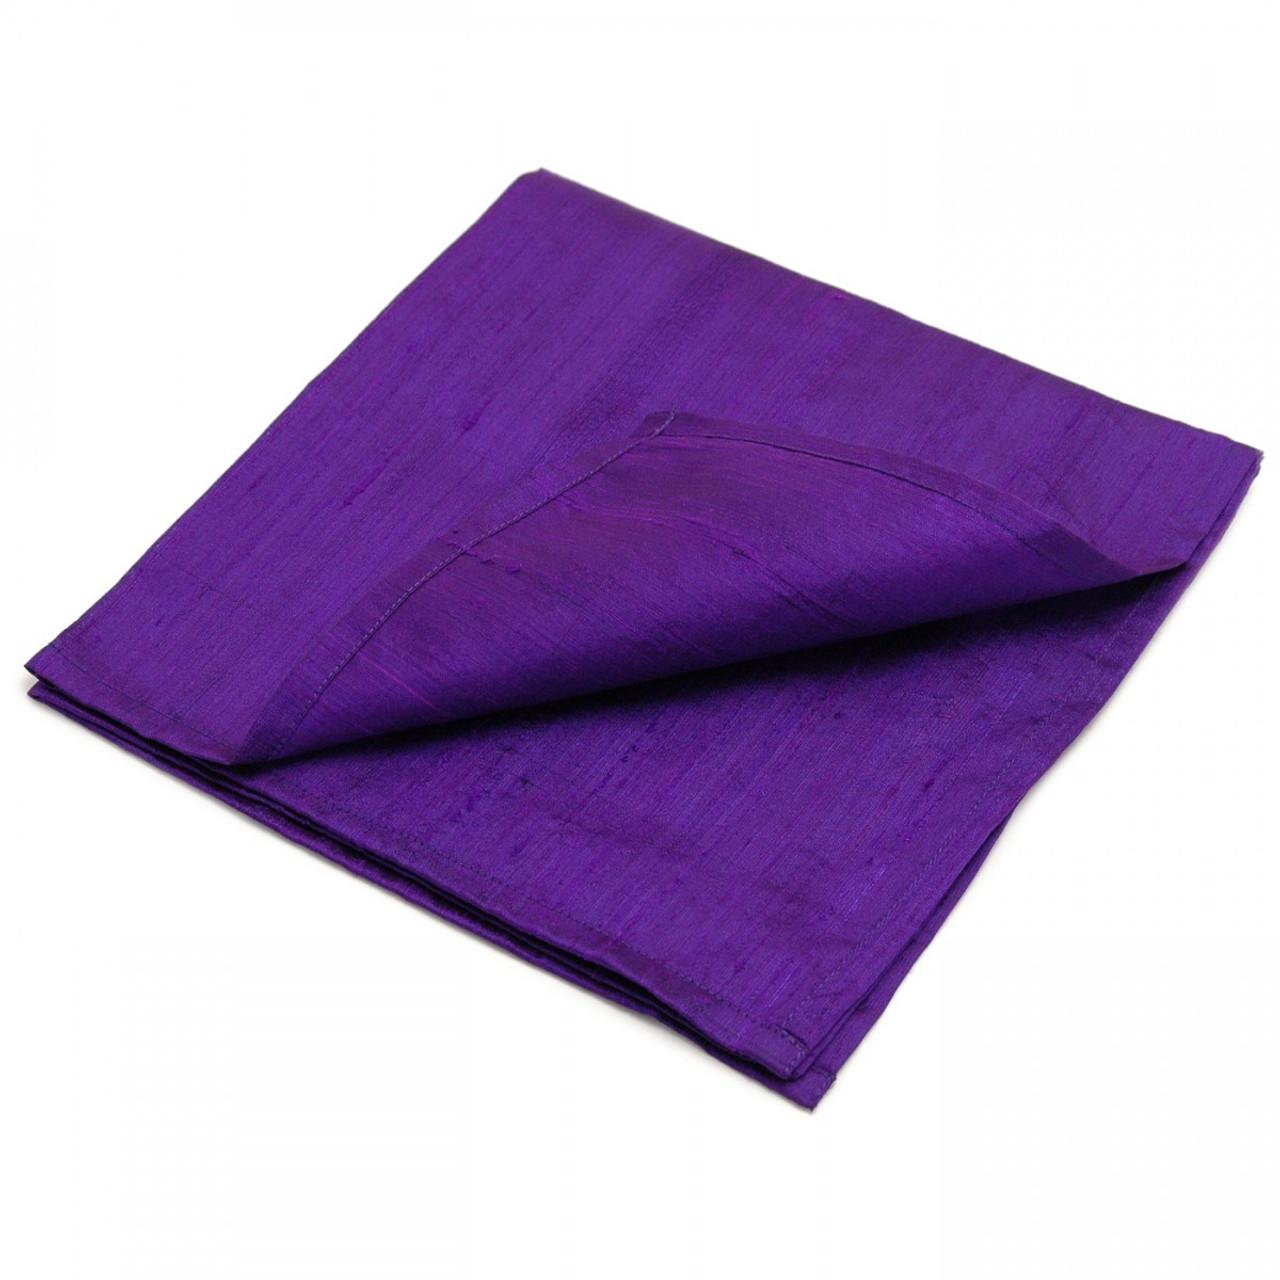 Large 100% SILK Reading Cloth - Purple (48 x 48 cm)